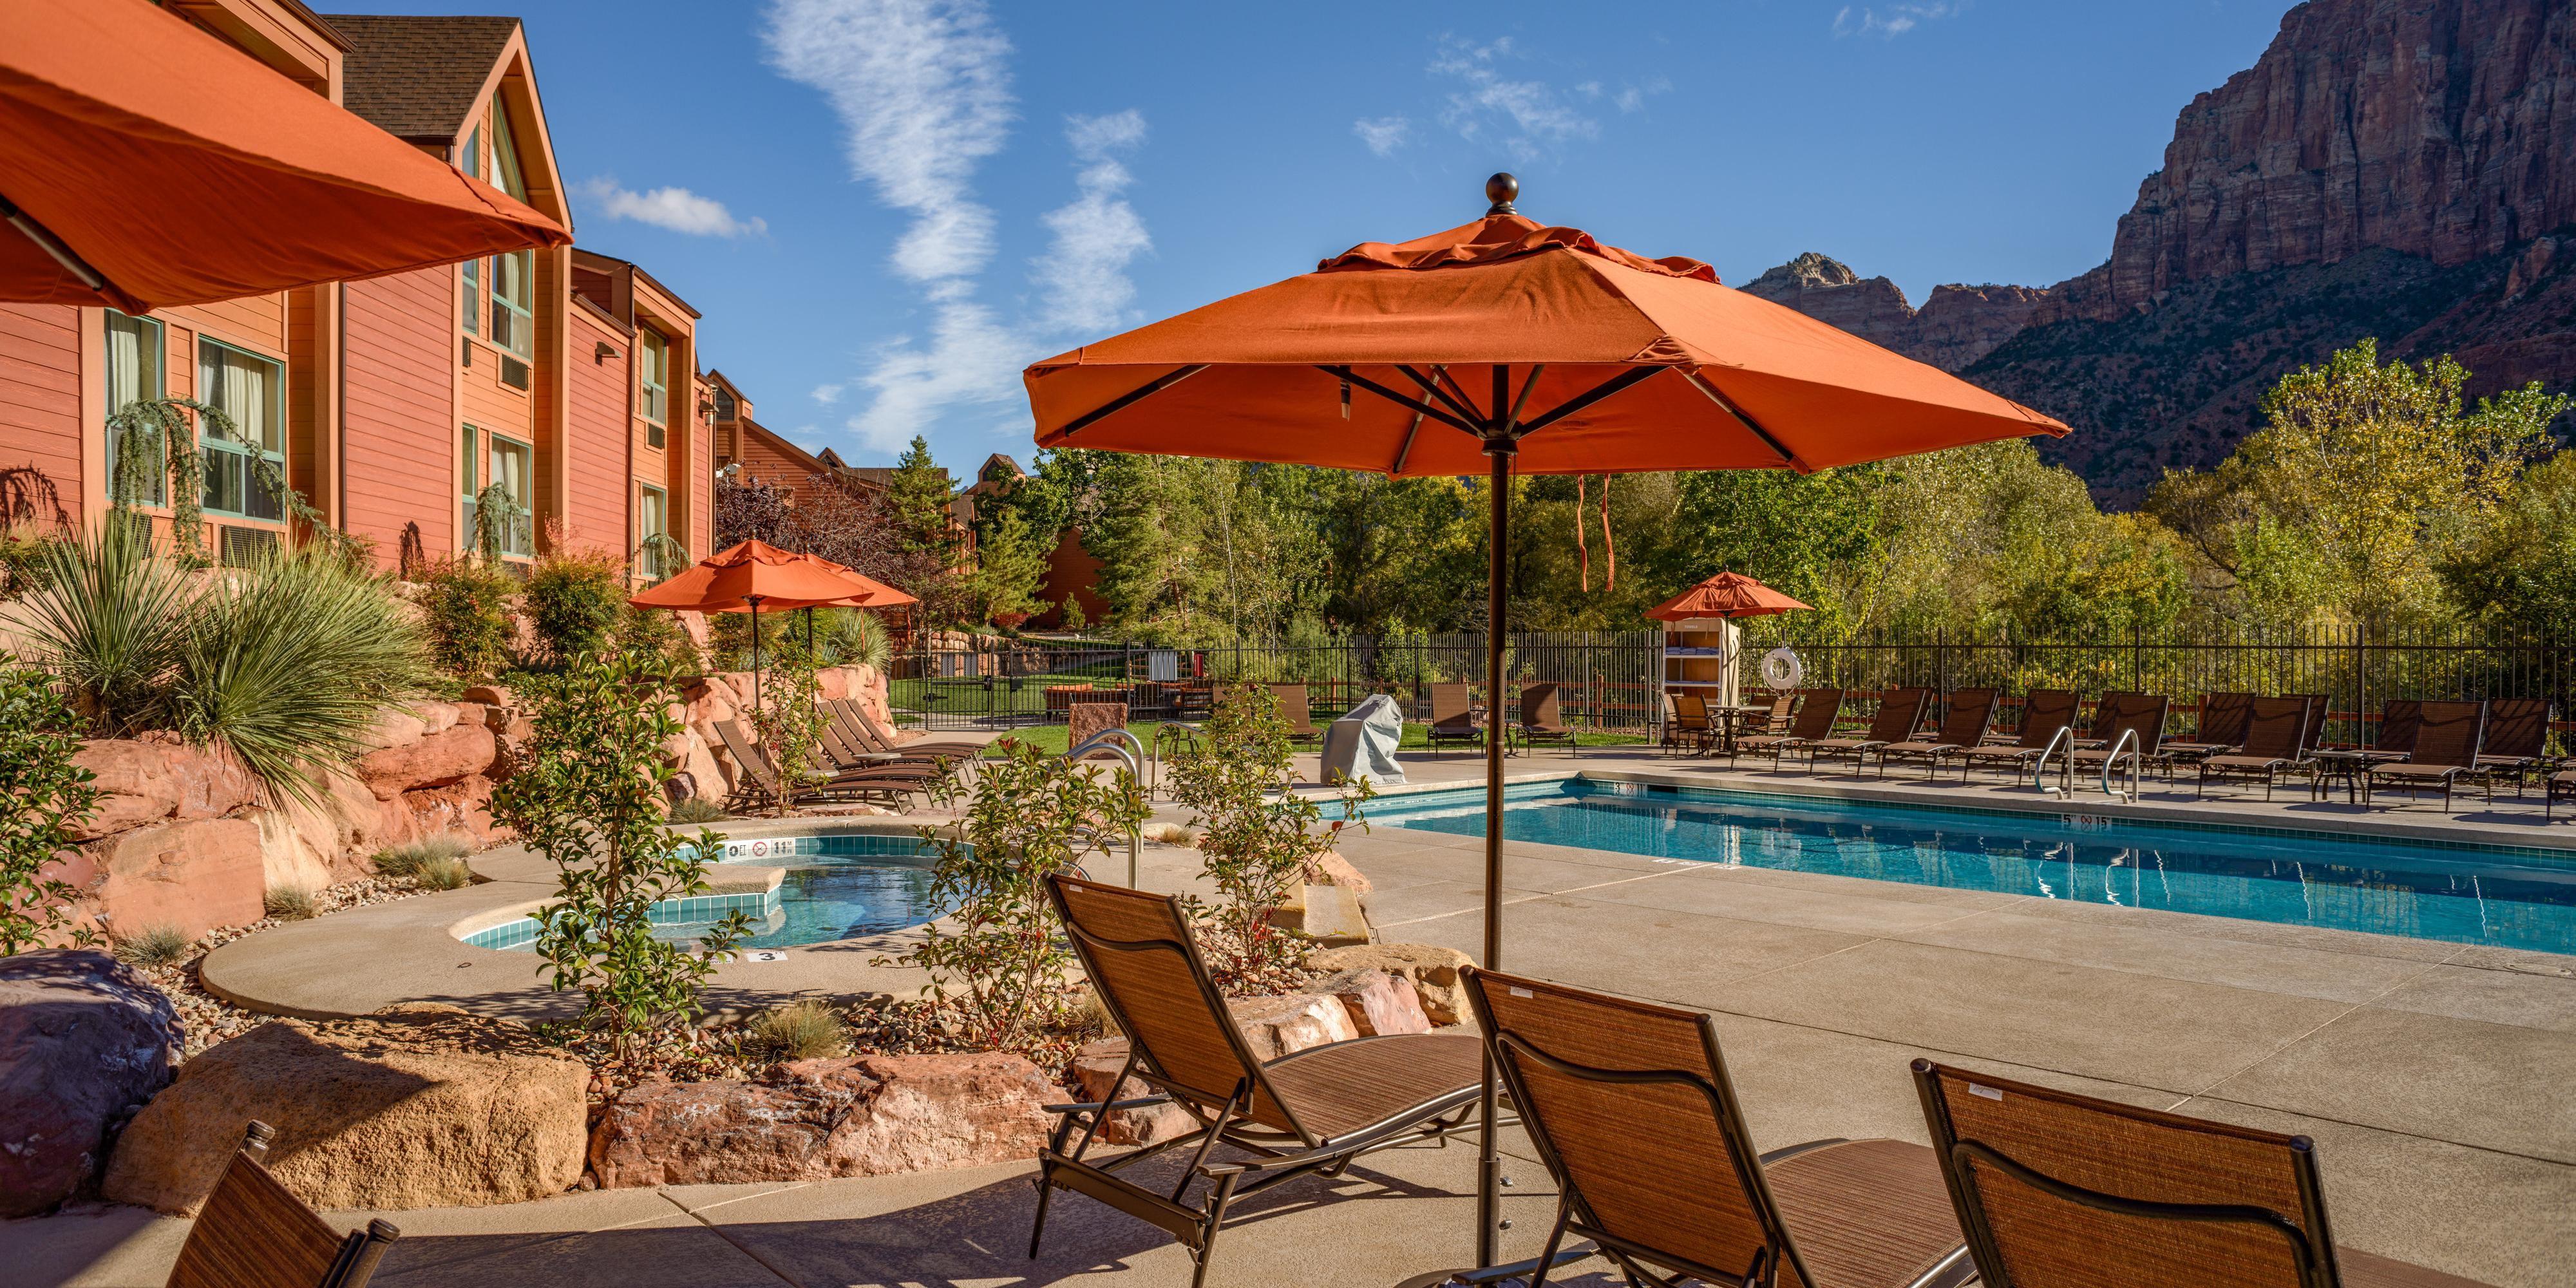 Holiday Inn Express Springdale 4177329132 2x1